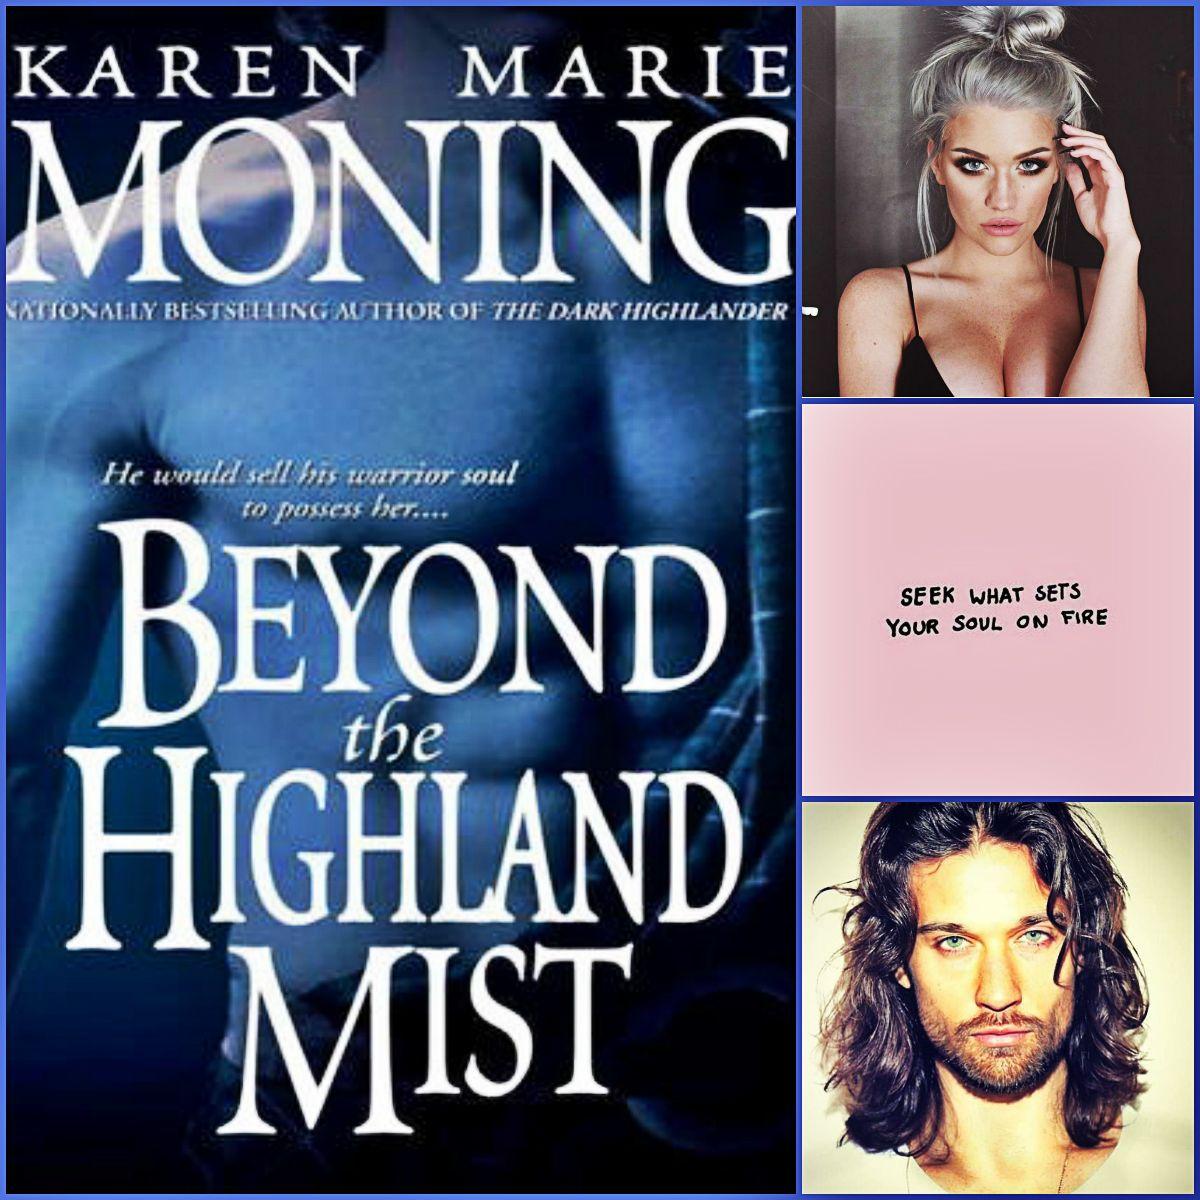 Beyond The Highland Mist By Karen Marie Moning Paranormal Romance Books Romance Books Karen Marie Moning